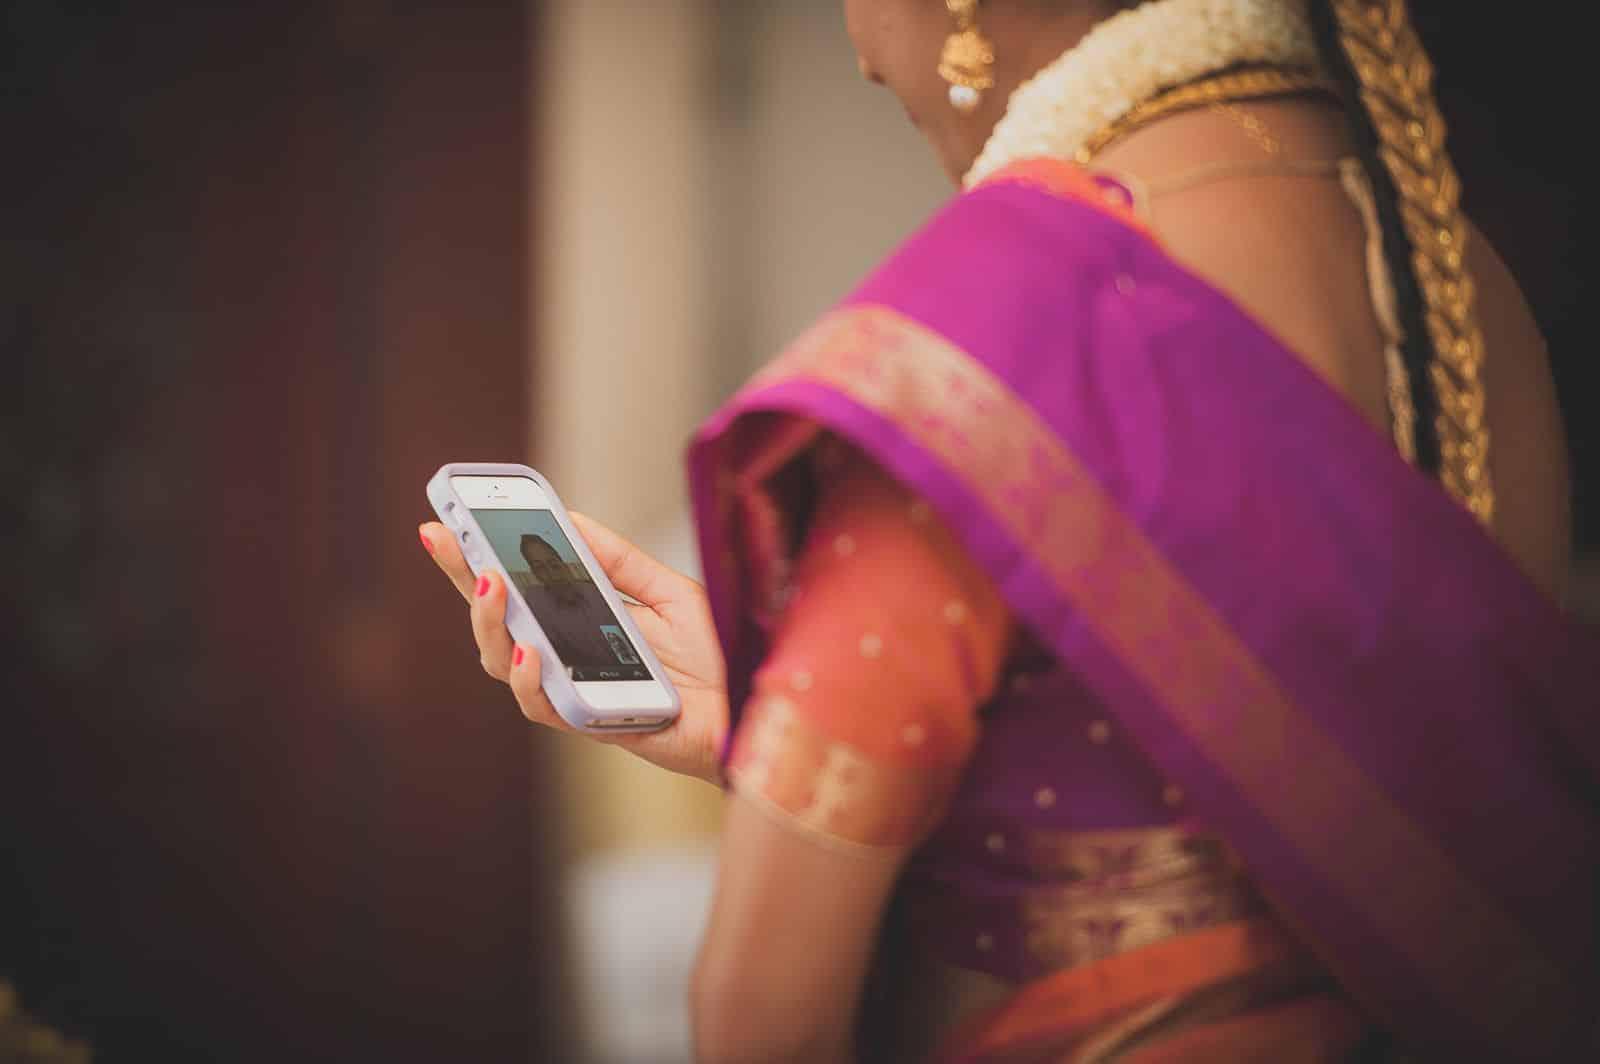 anoop-wedding-photographer-mehendi-bride-facetime-groom